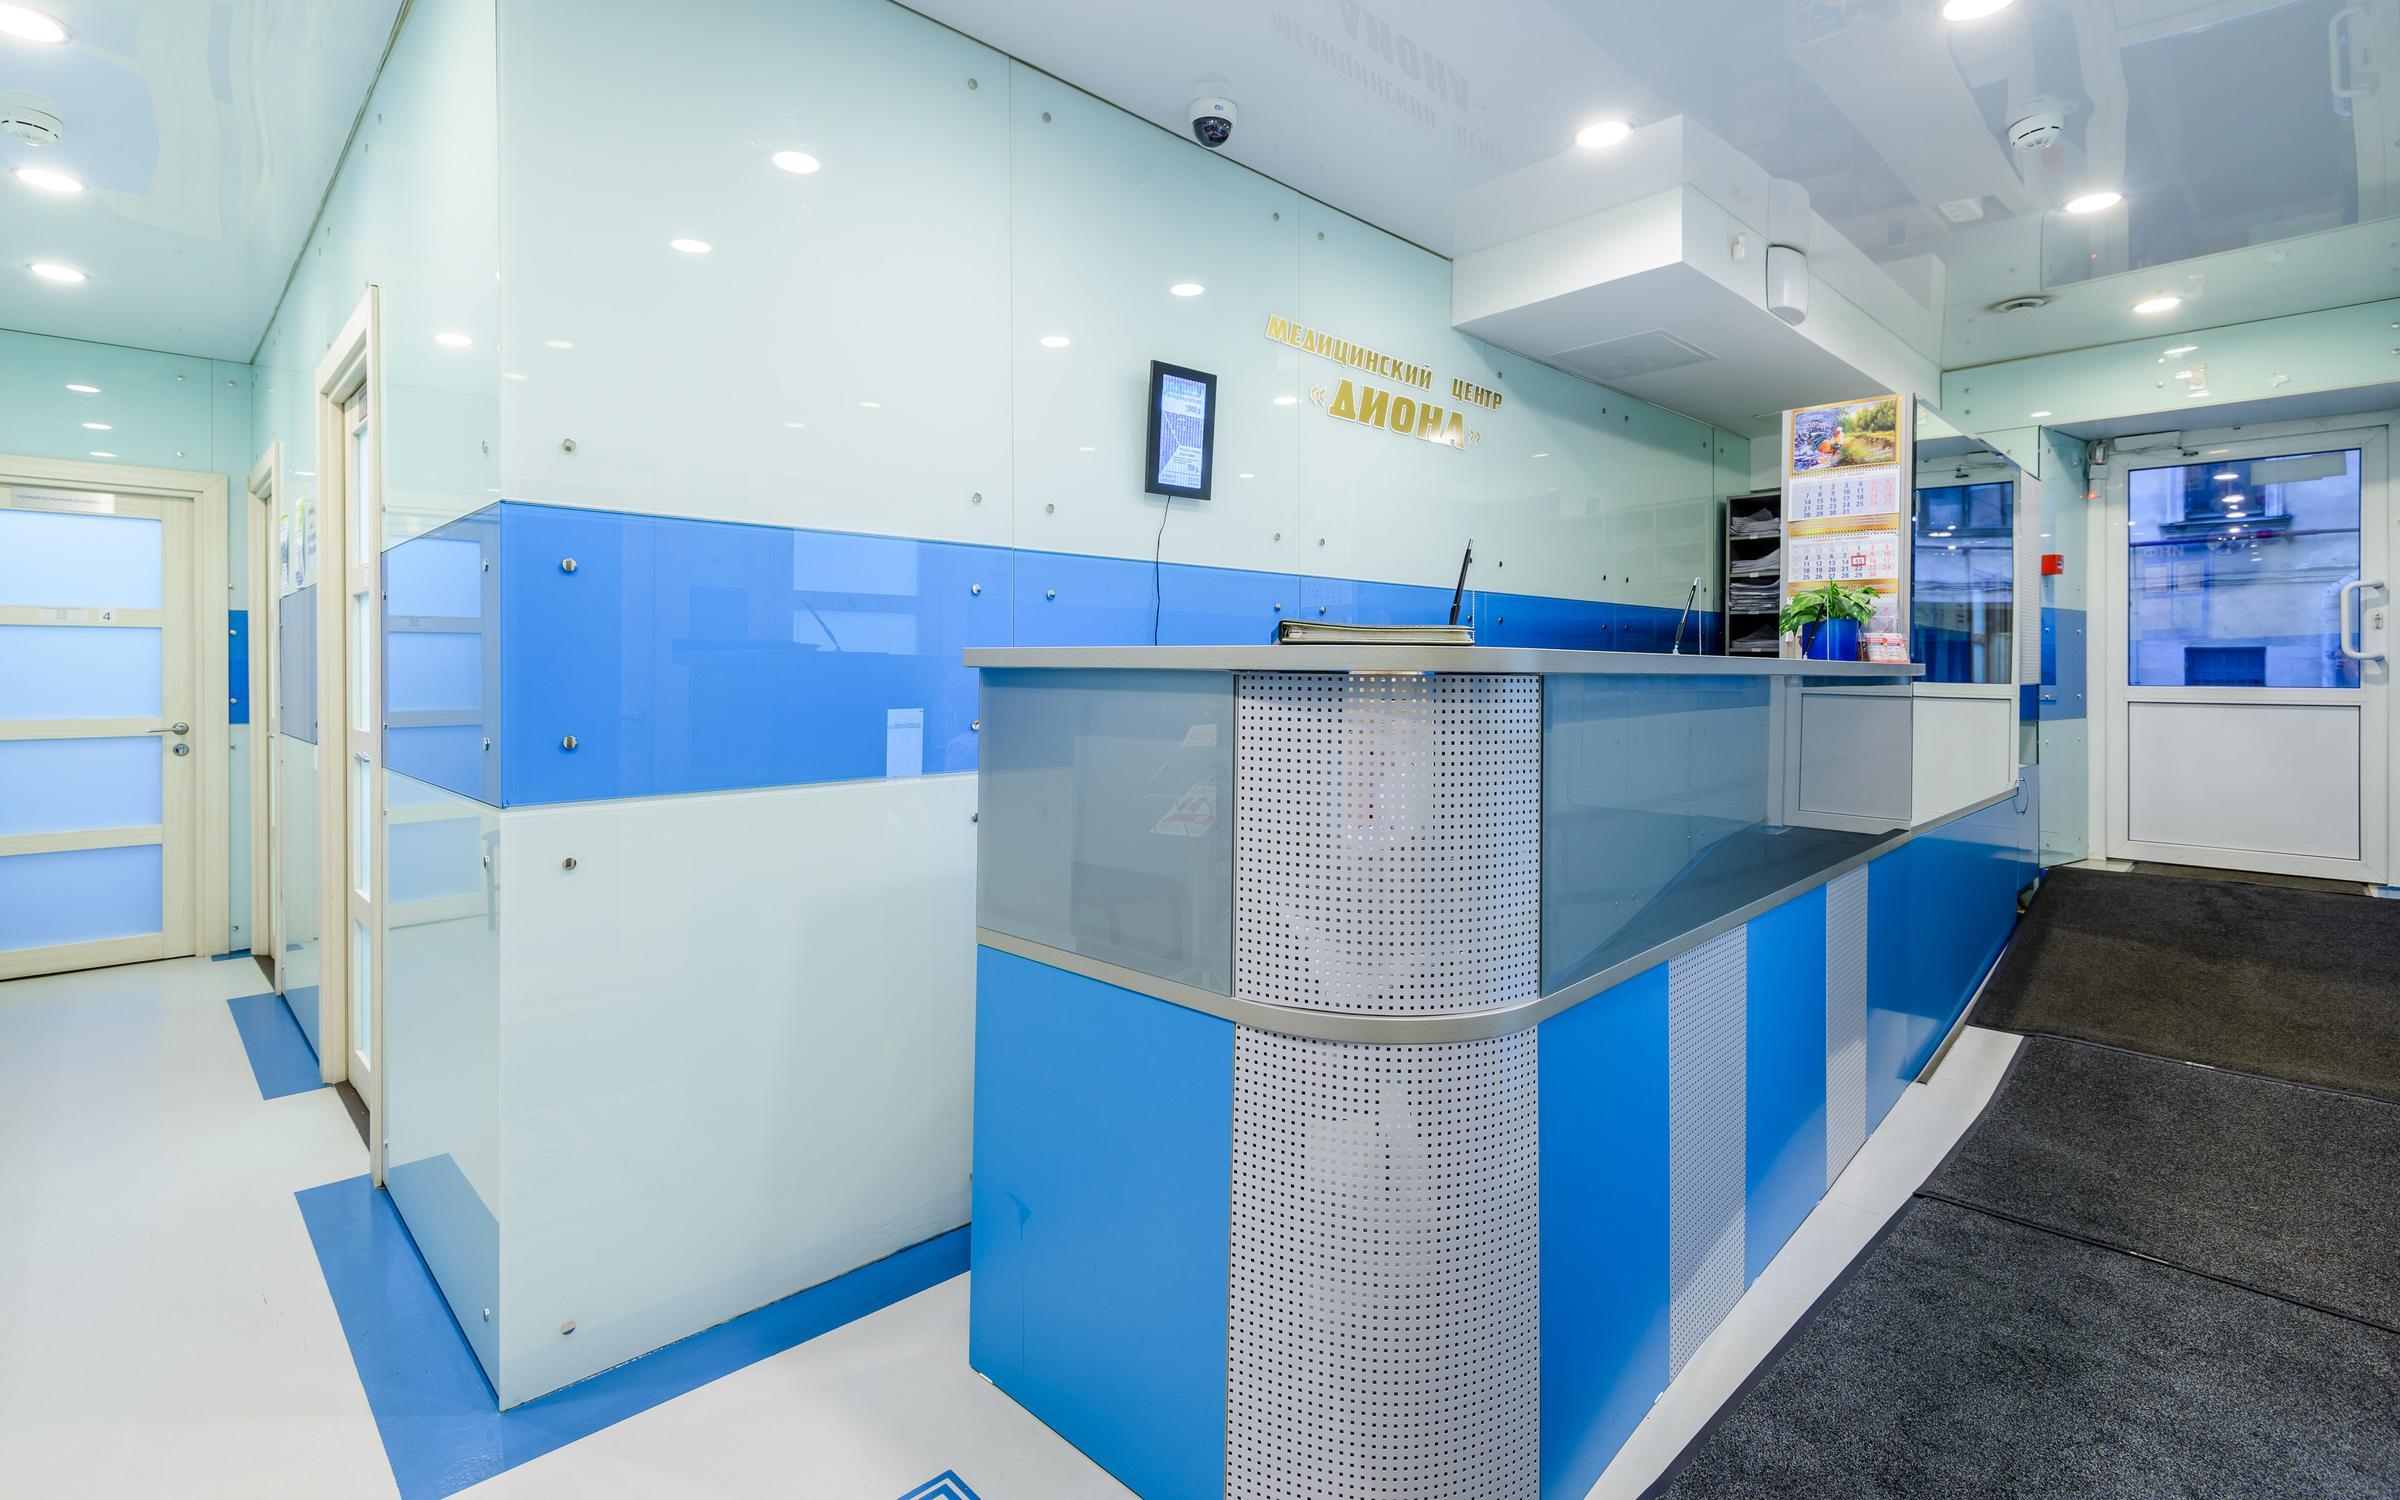 фотография Медицинского центра Диона на метро Площадь Ленина